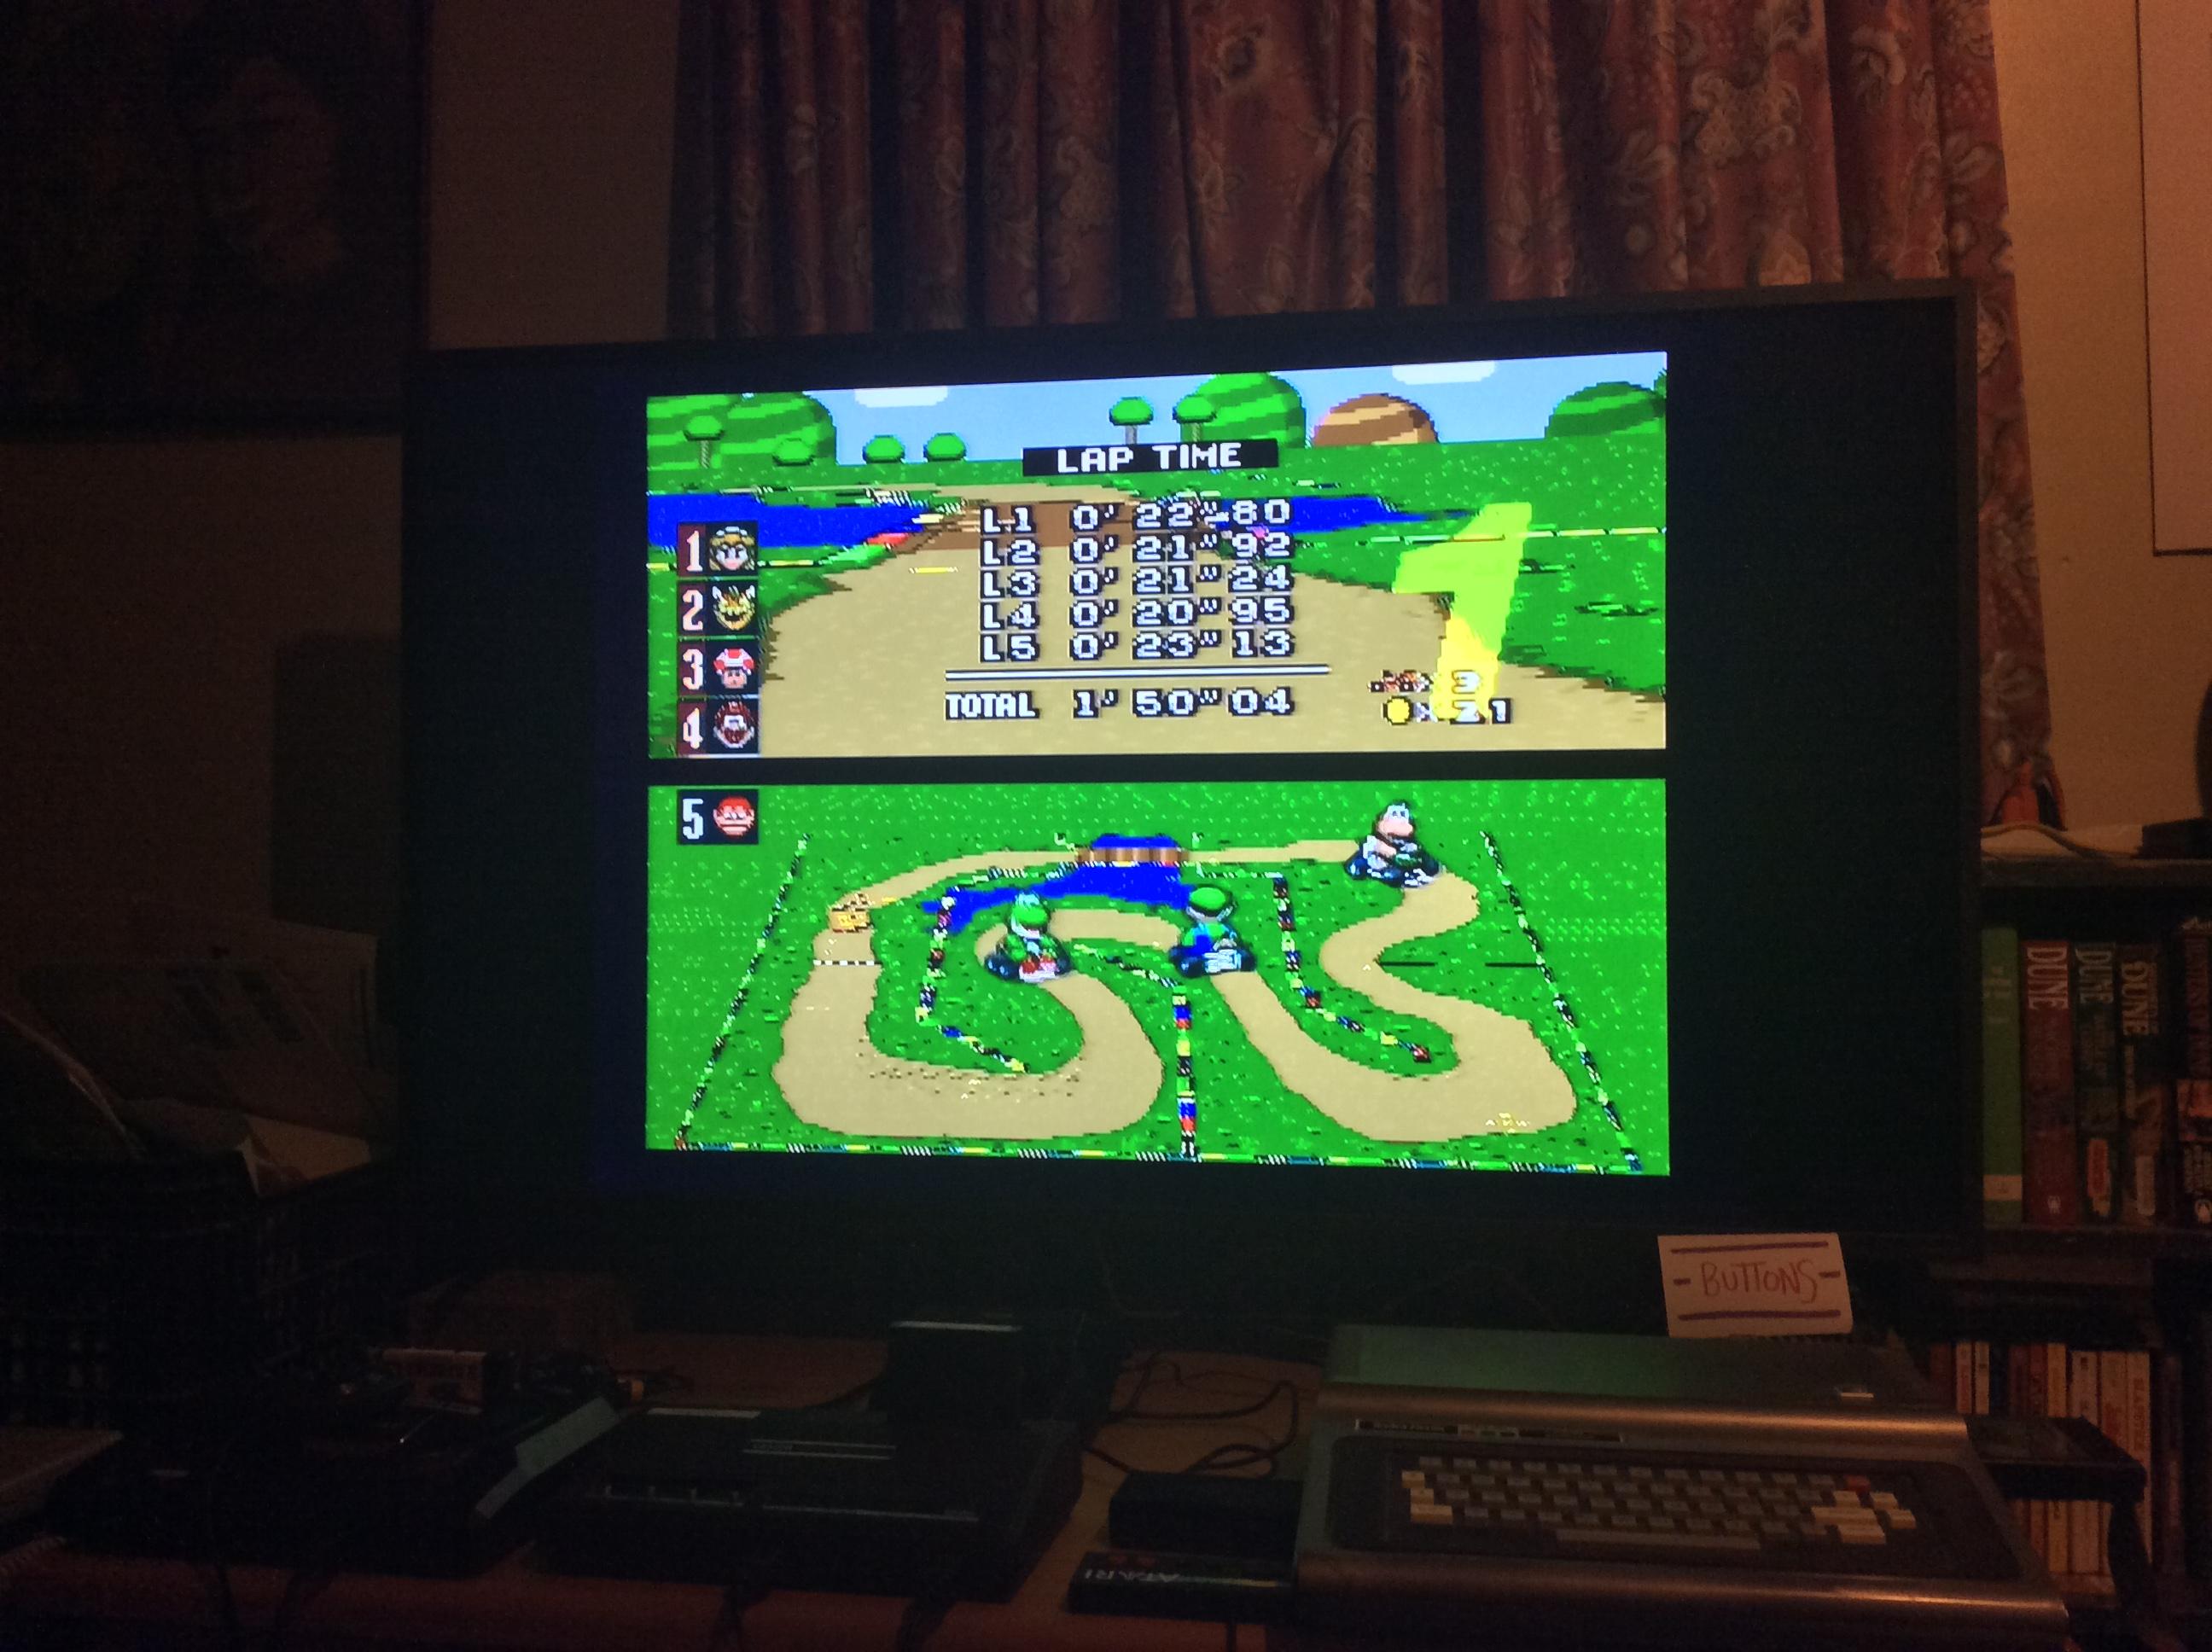 Super Mario Kart [Mushroom Cup: Donut Plains 1: 50CC] time of 0:01:50.04